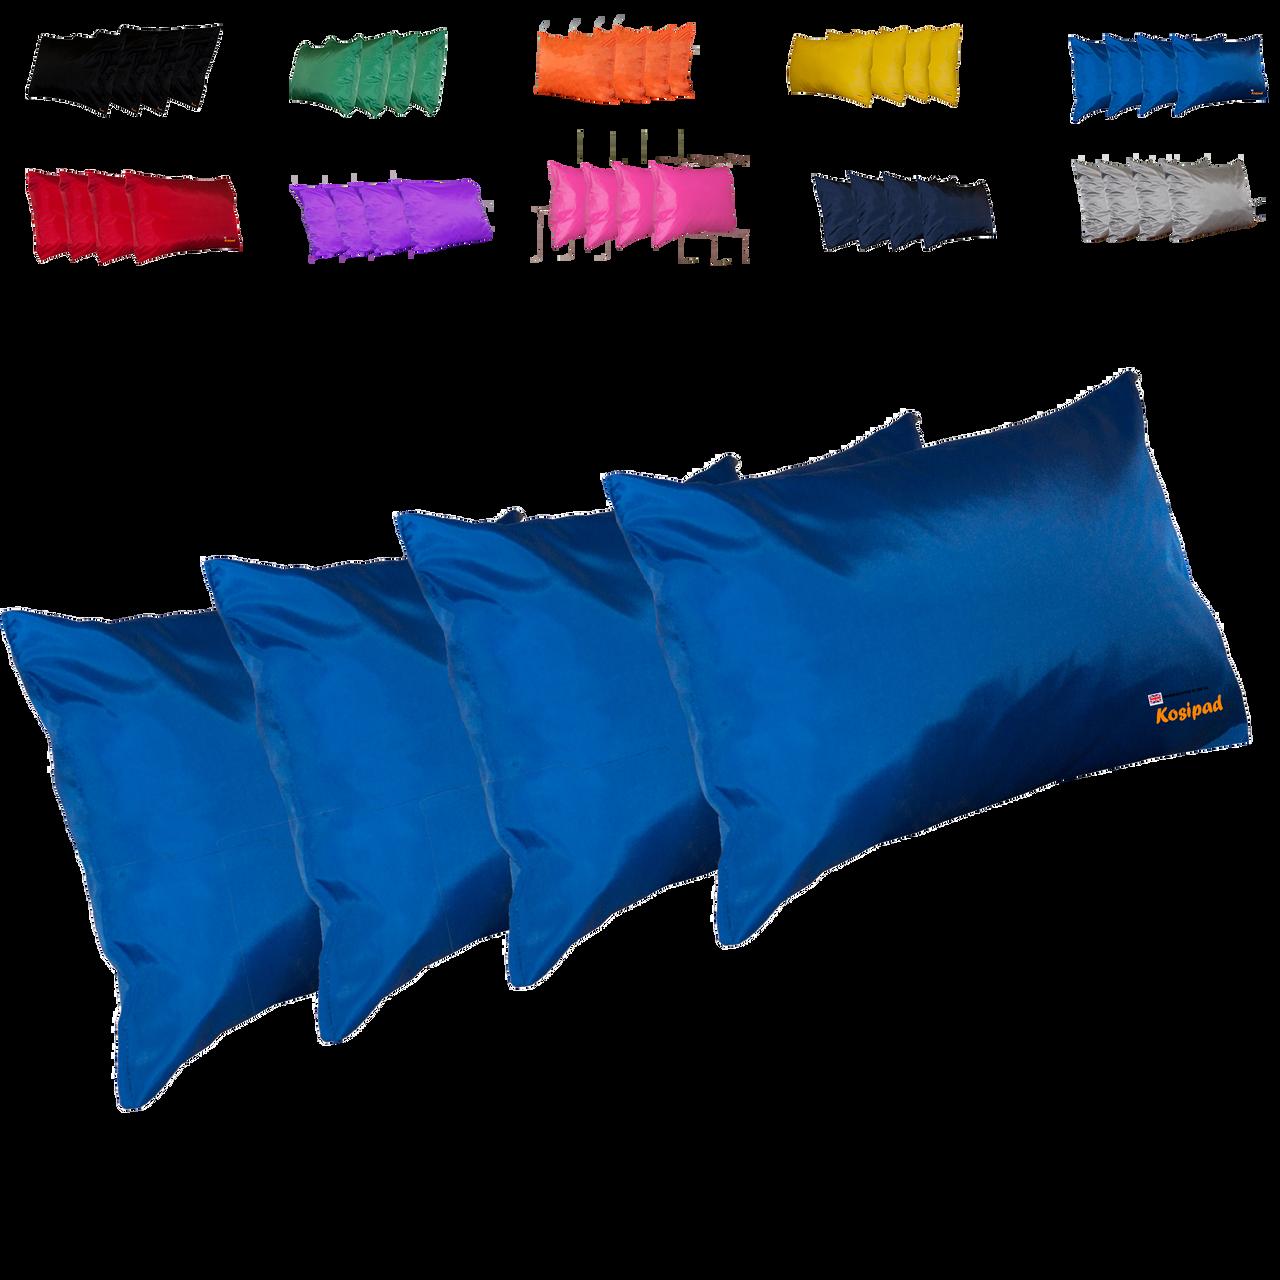 Kosipad Royal Blue Square waterproof garden cushions